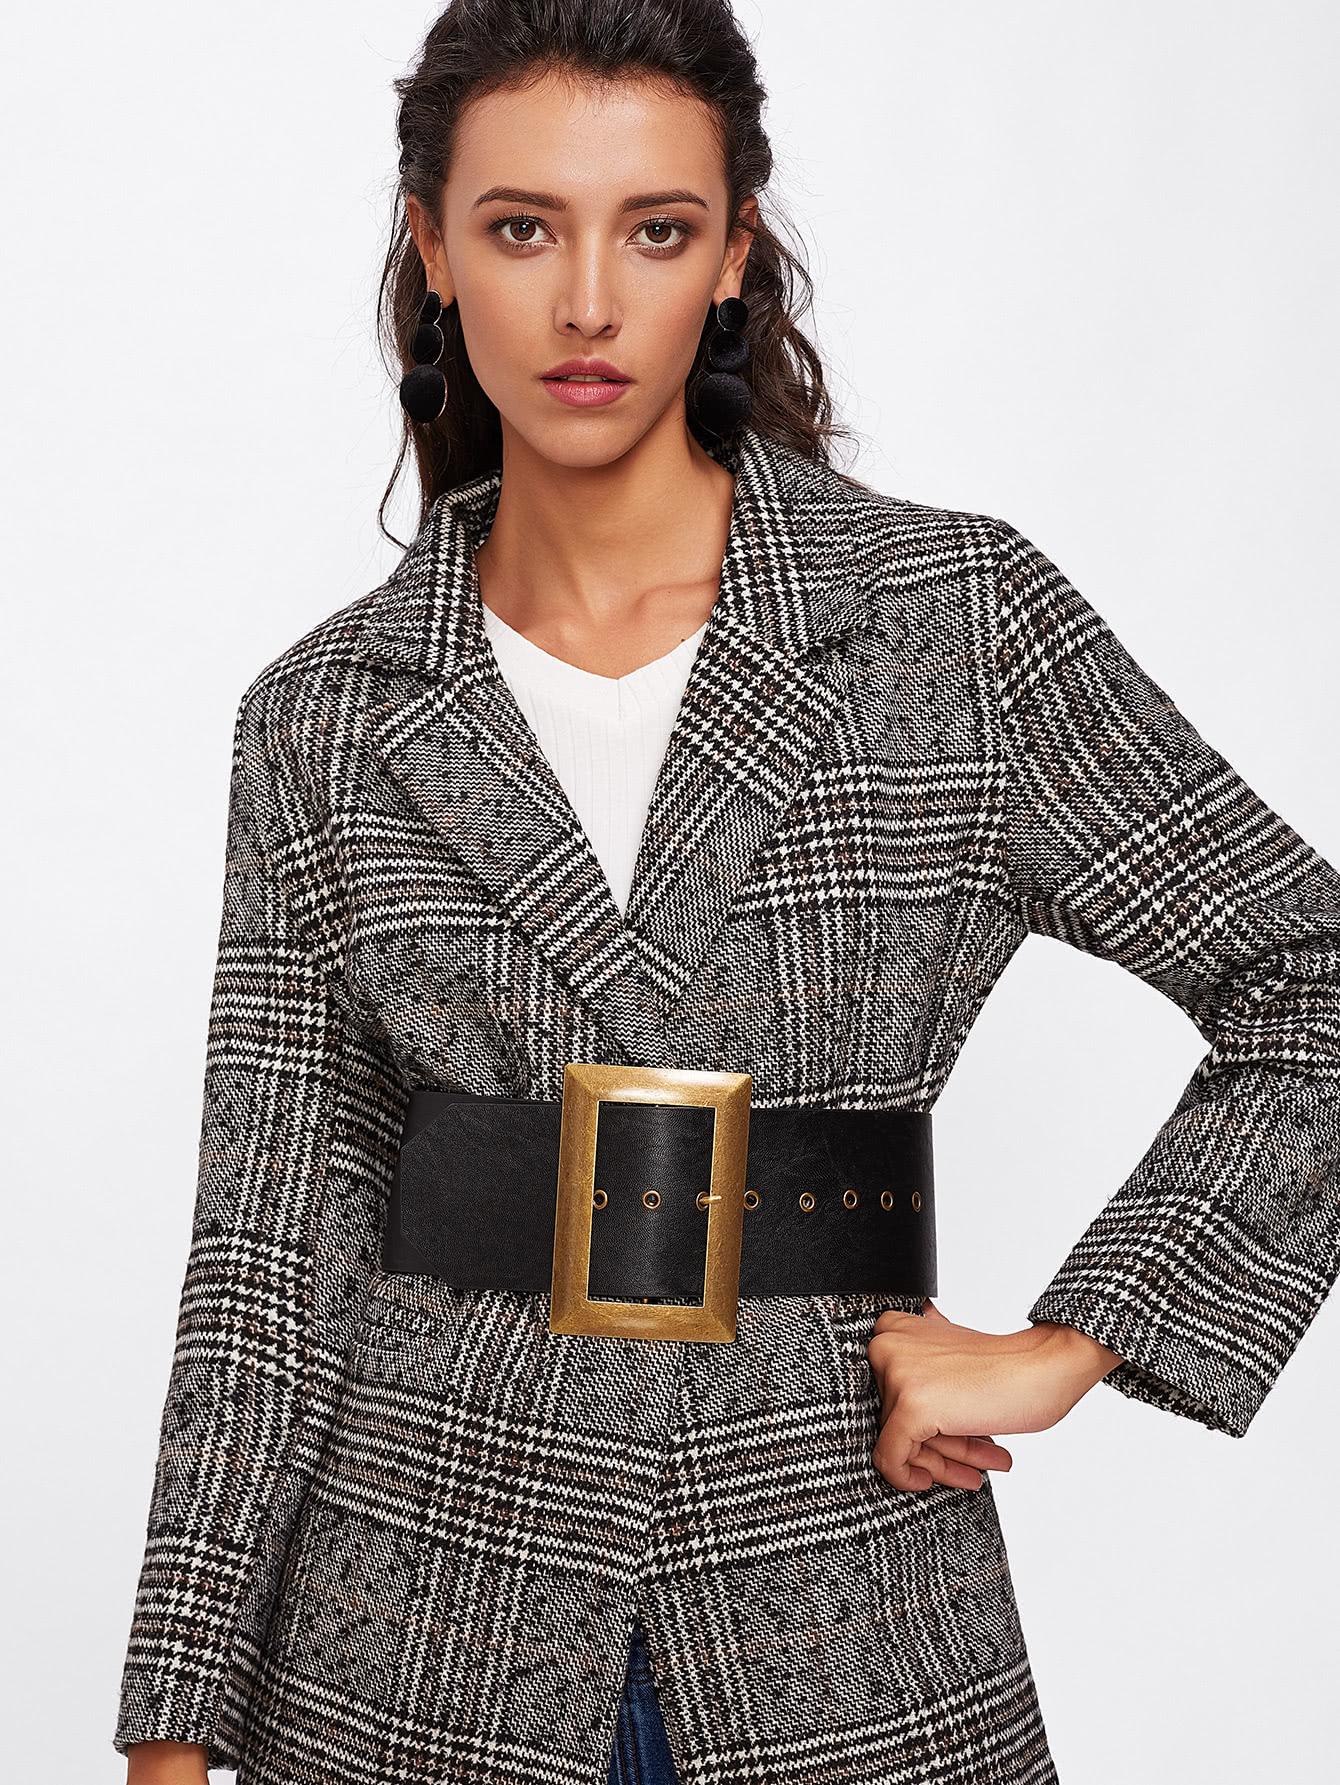 Oversized Square Buckle Belt women fashion square buckle basic dress leatherette wide belt